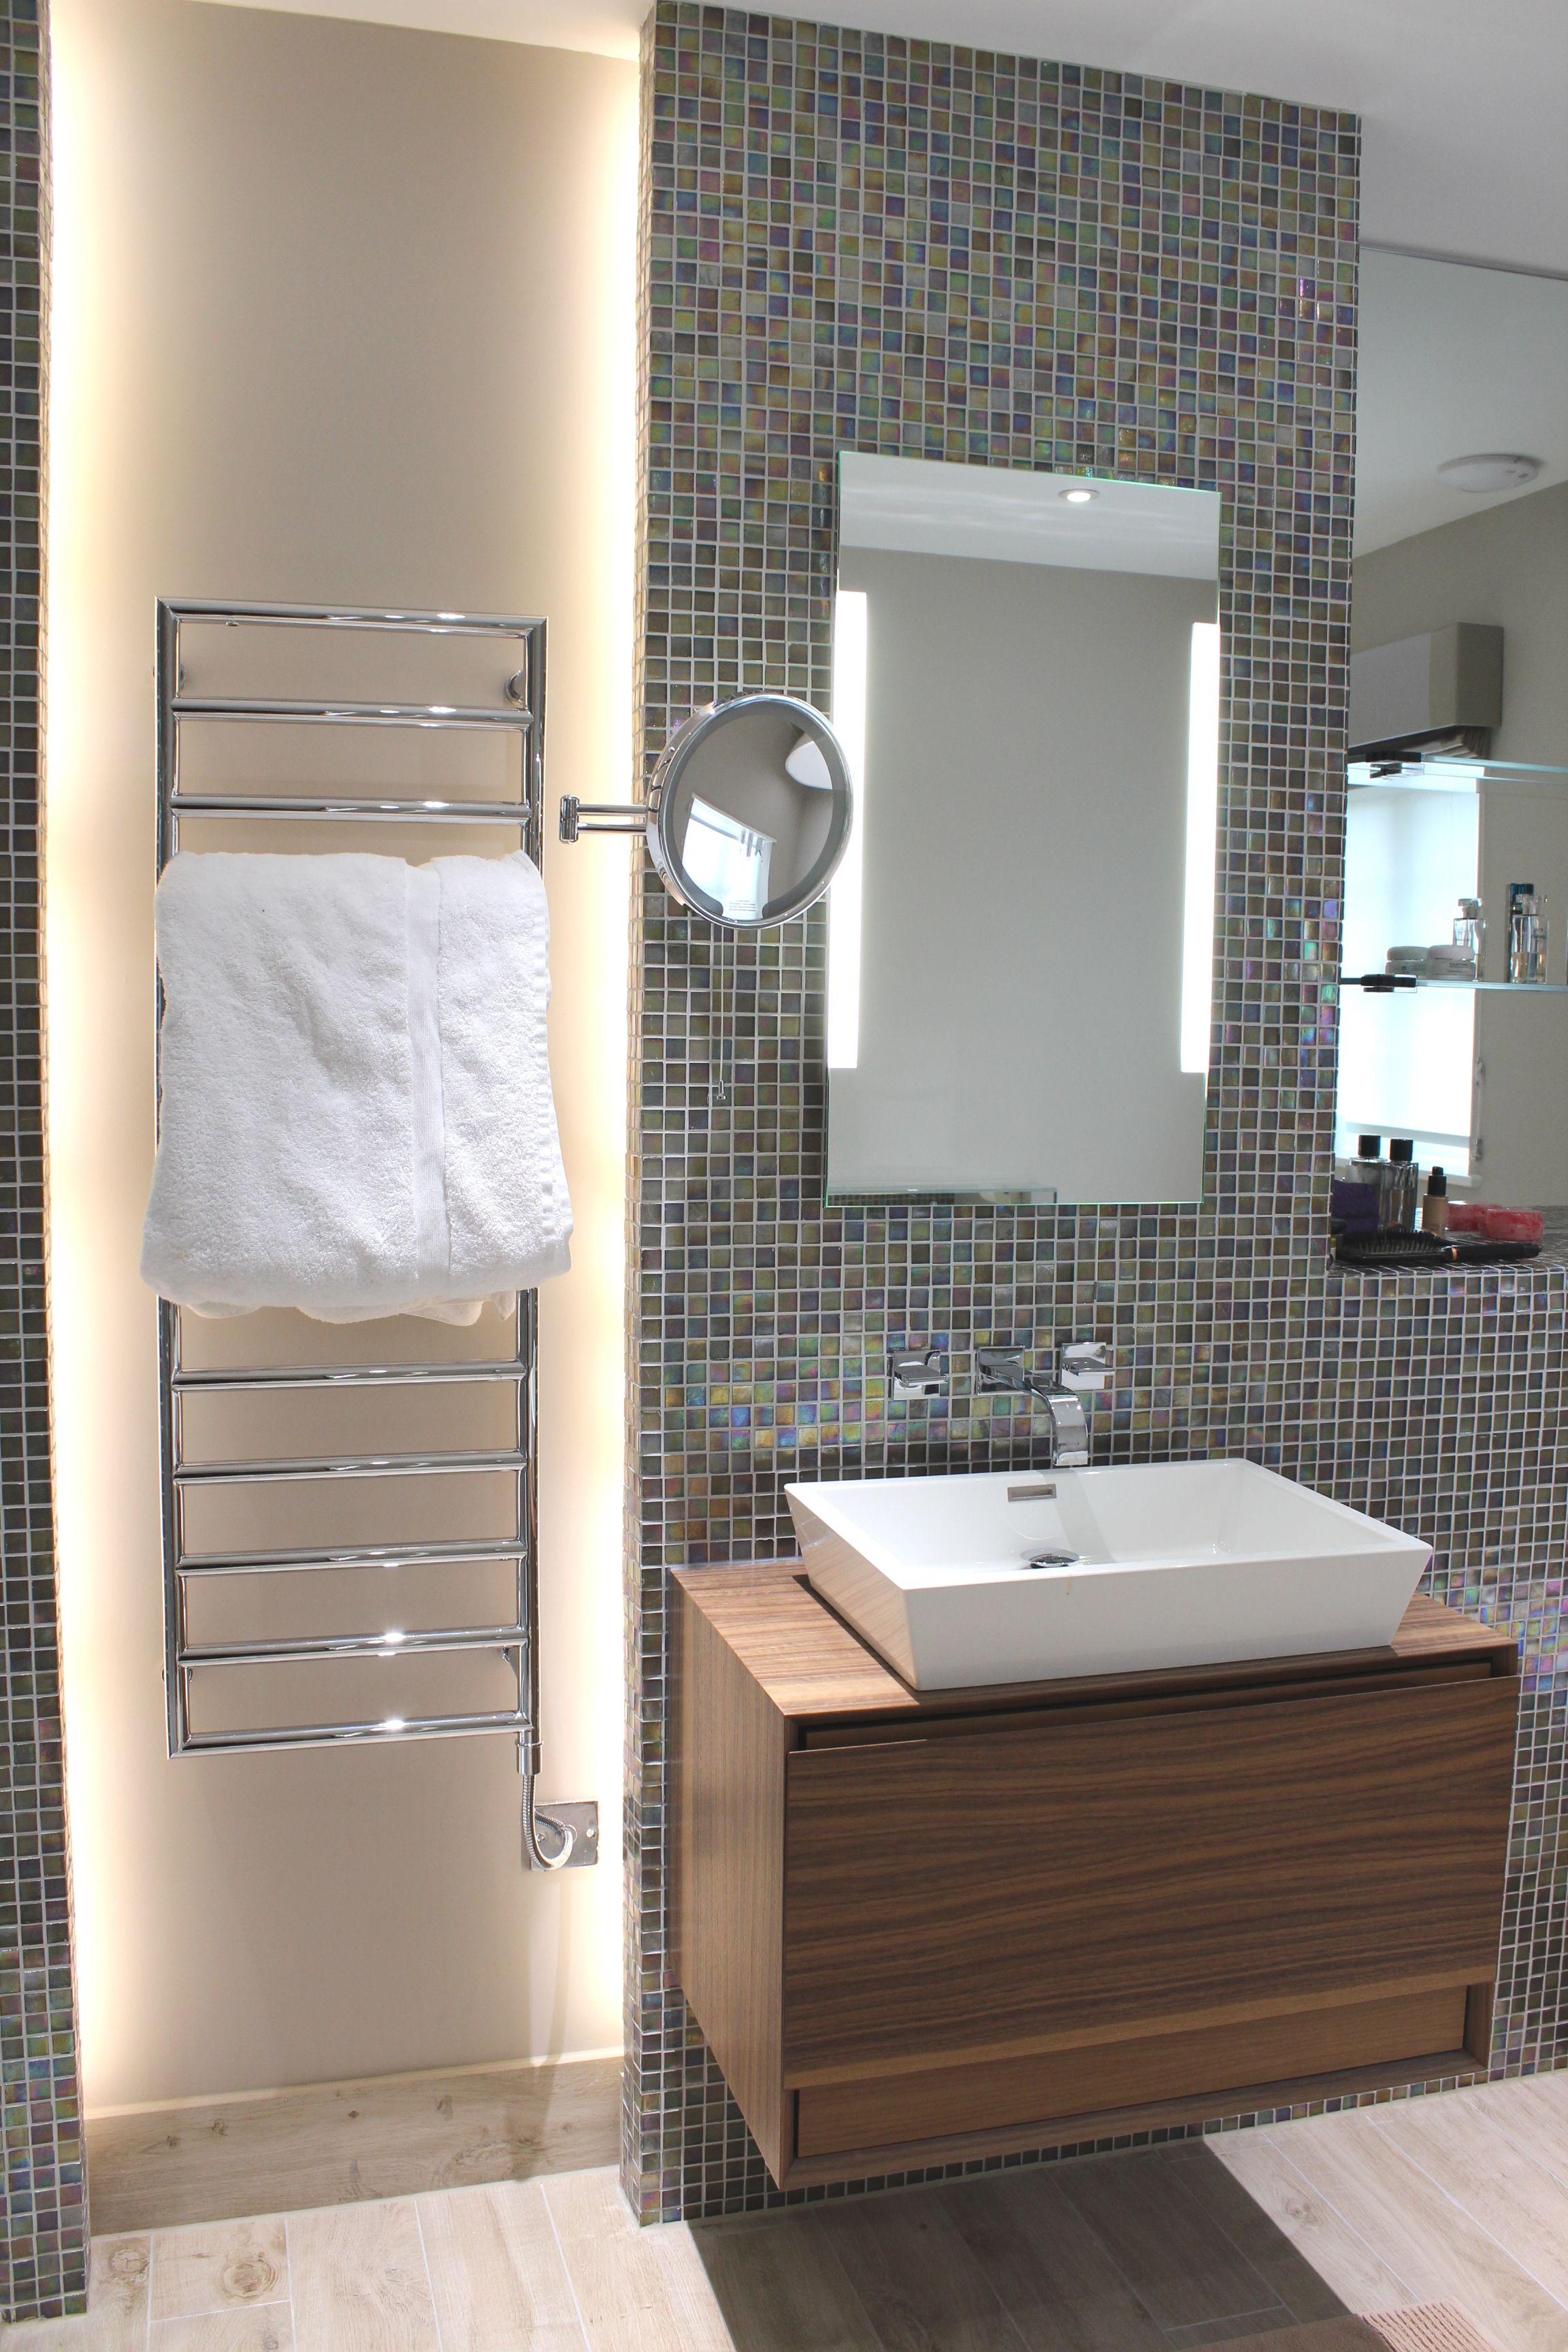 Designed By Monita Cheung Modern Bathroom Dornbracht Mem Wall Mounted Mixer Natural Walnut Vanity Unit Countertop Basin Mosaics Bespoke Mirror